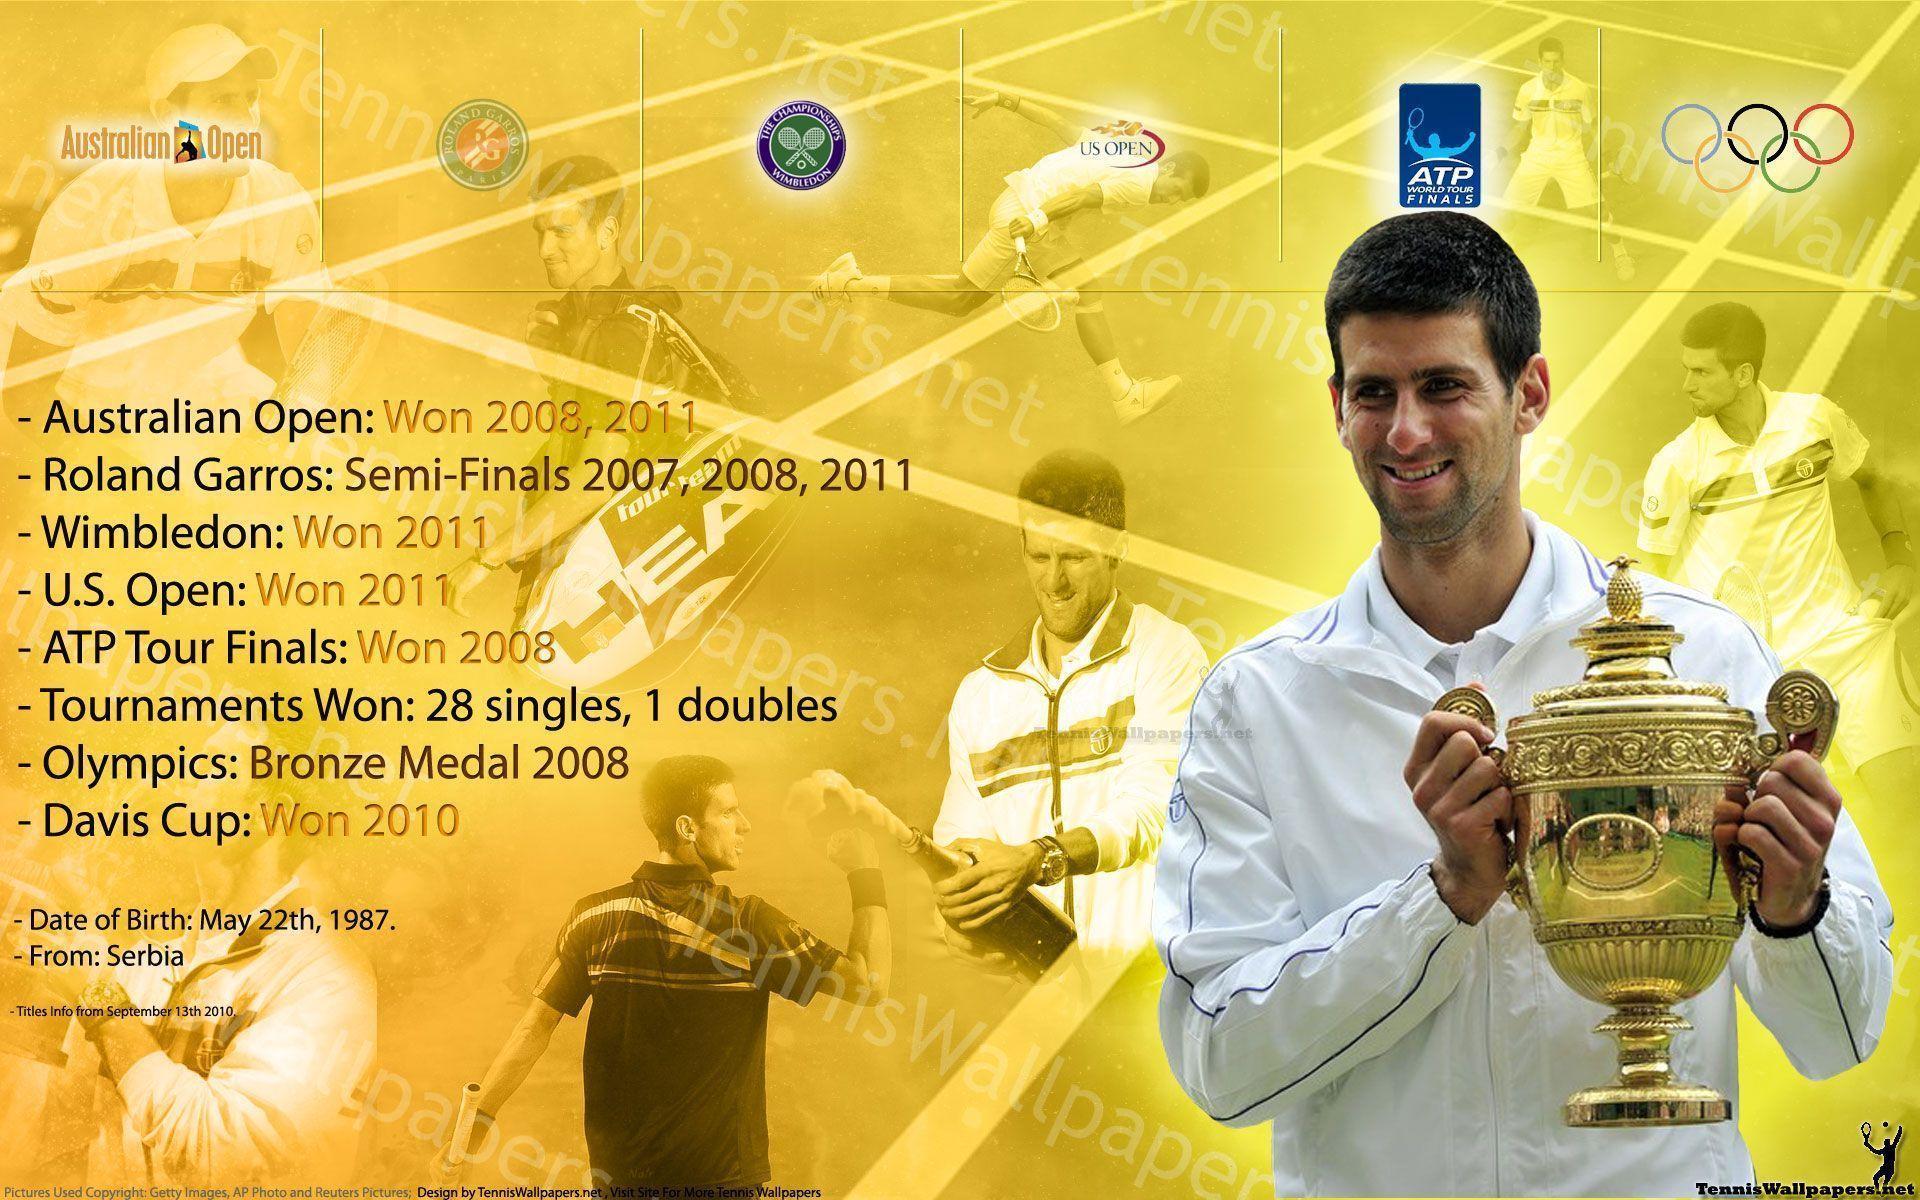 Novak Djokovic Career Info Widescreen Wallpaper - Tennis Wallpapers